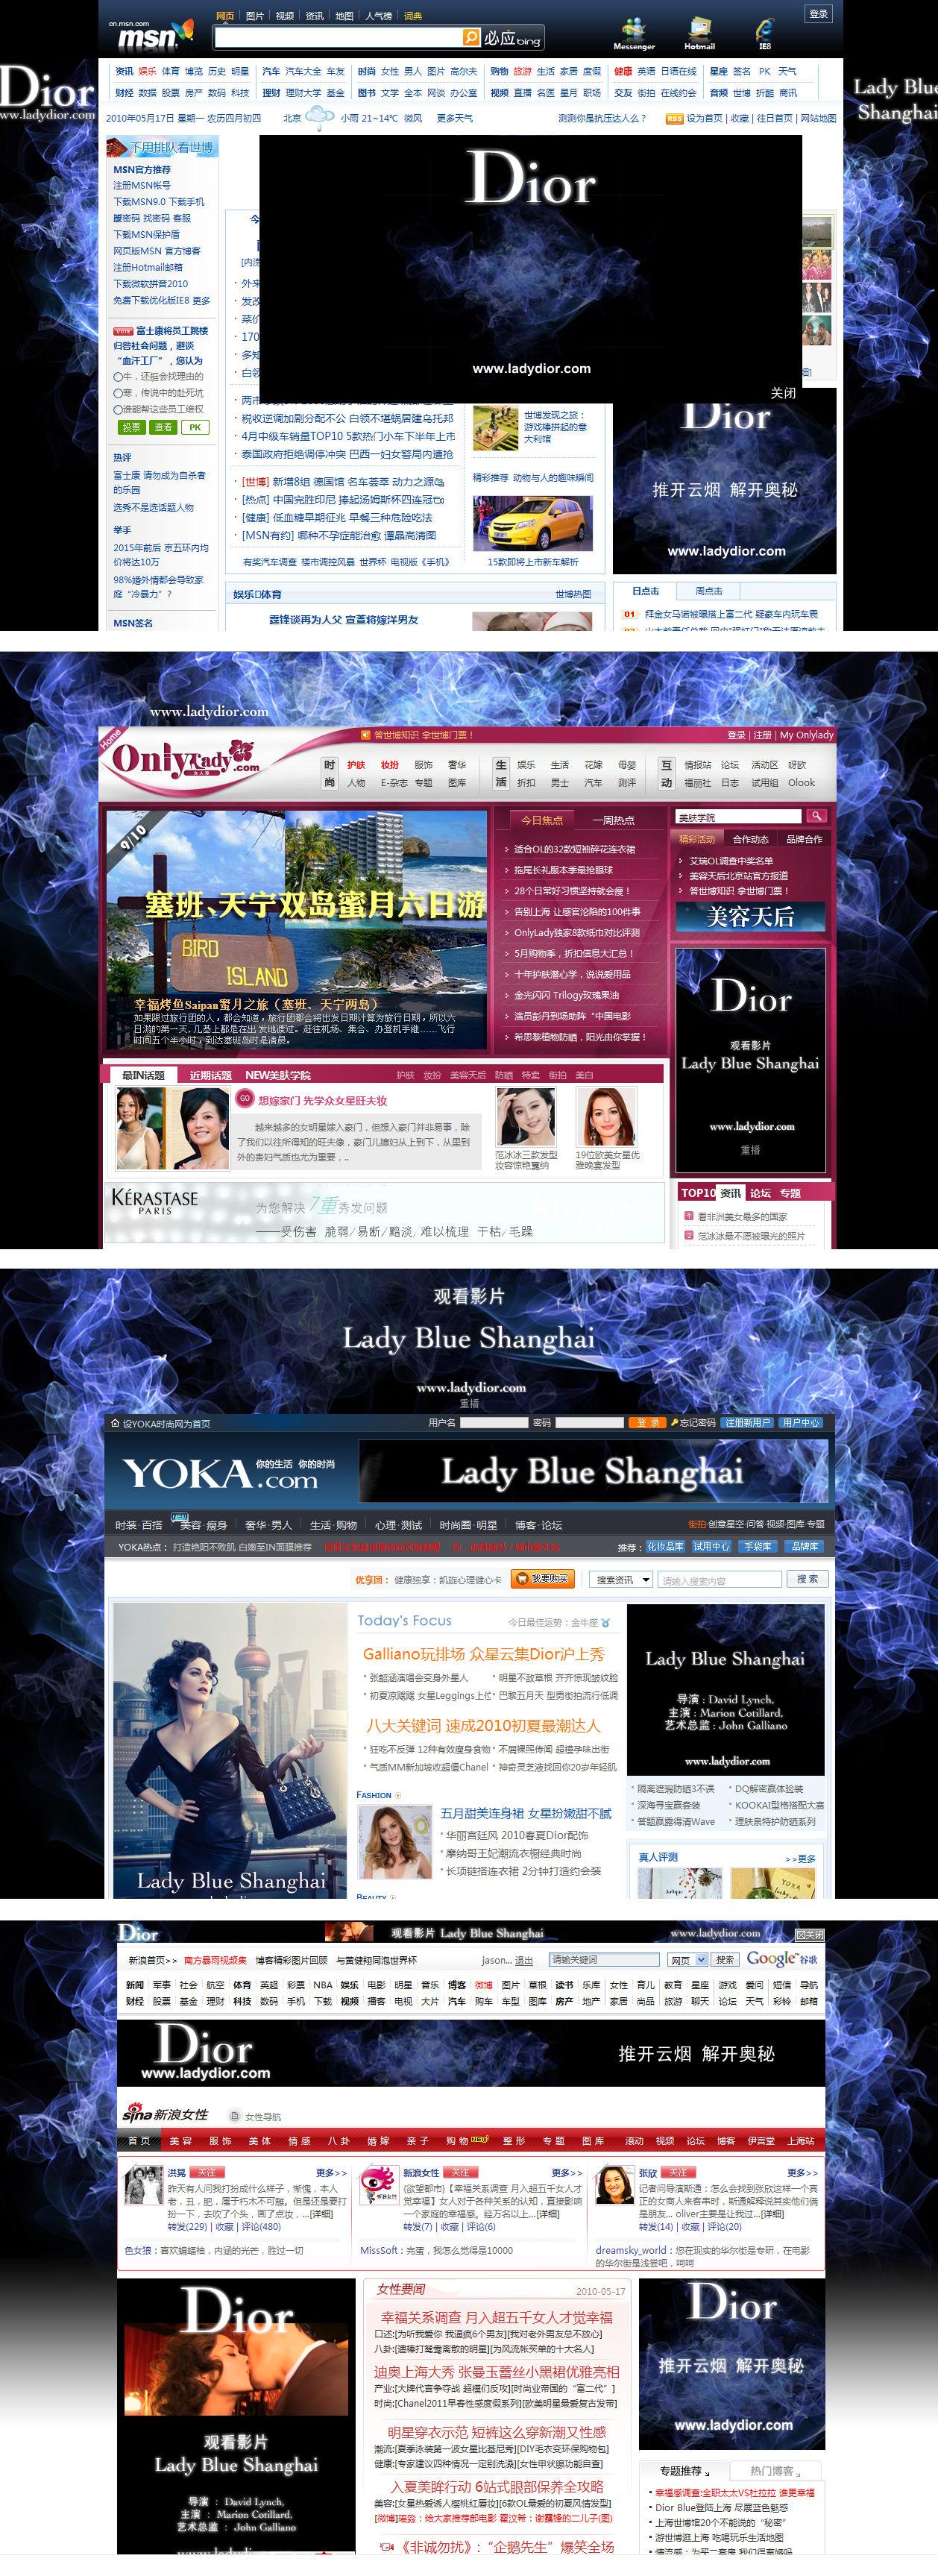 Lady Chine Dior